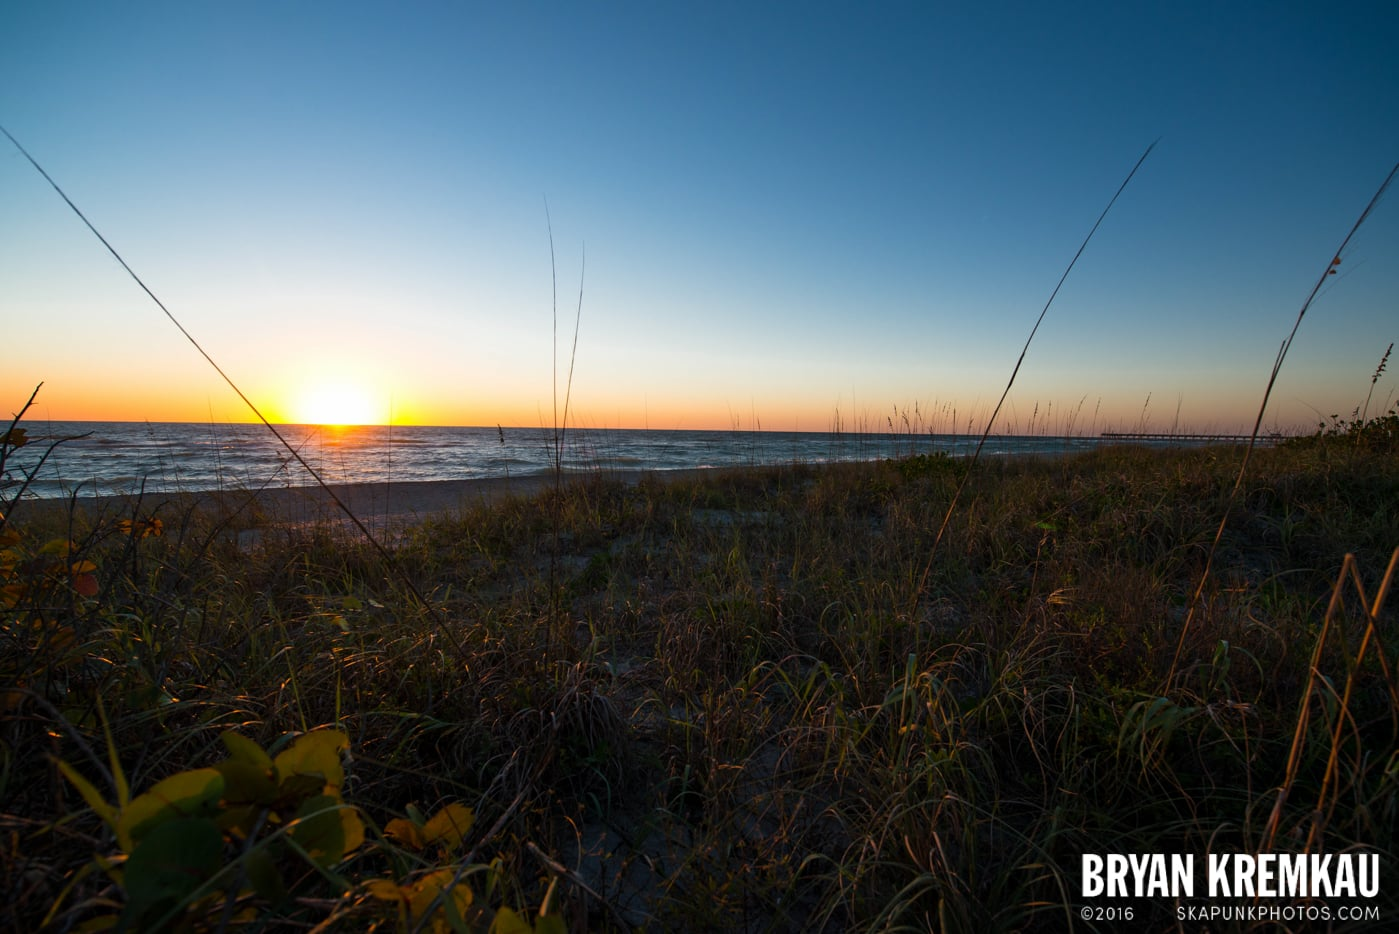 Sunsets, Astrophotography & Birds @ Venice, Florida - 10.25.14 - 11.5.14 (100)